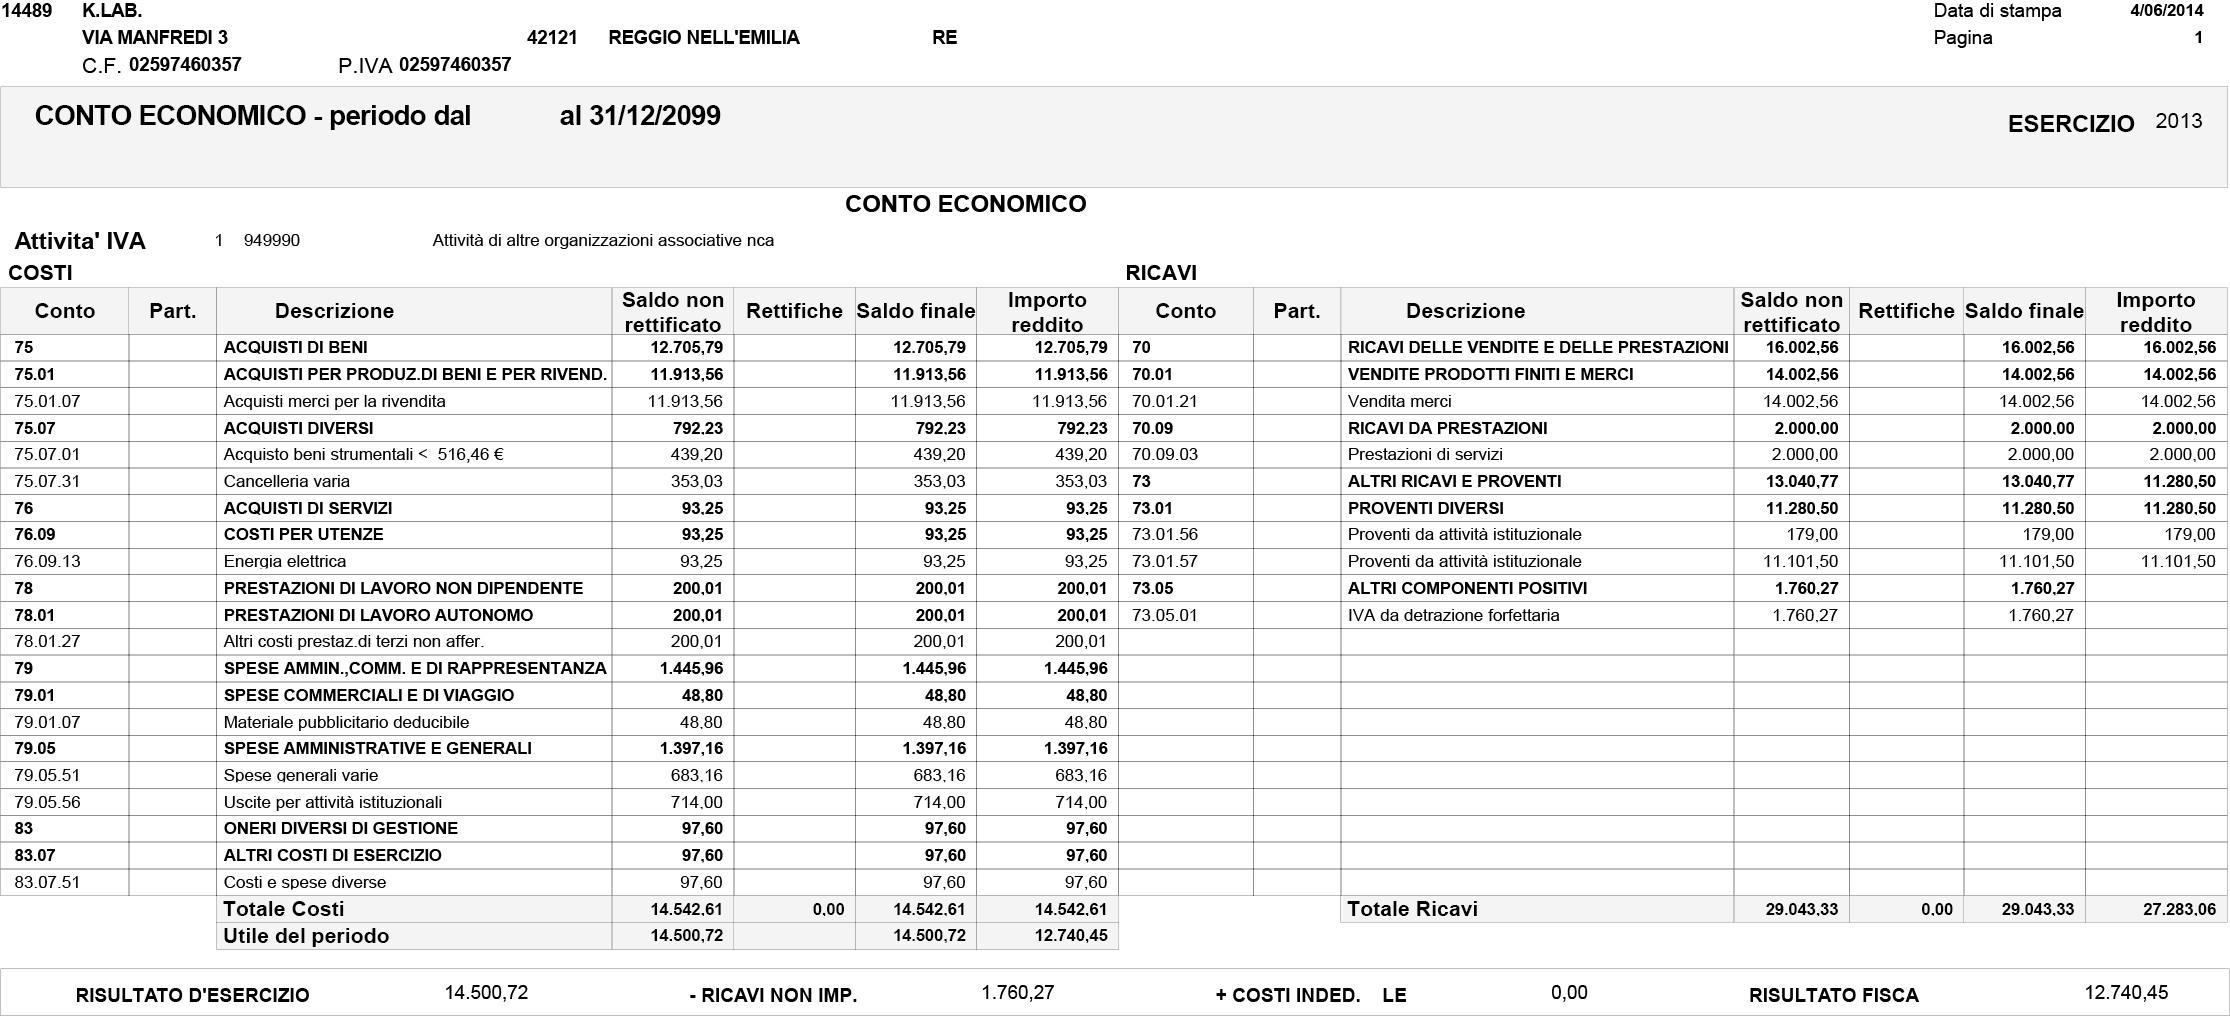 bilancio verifica 31dic2013